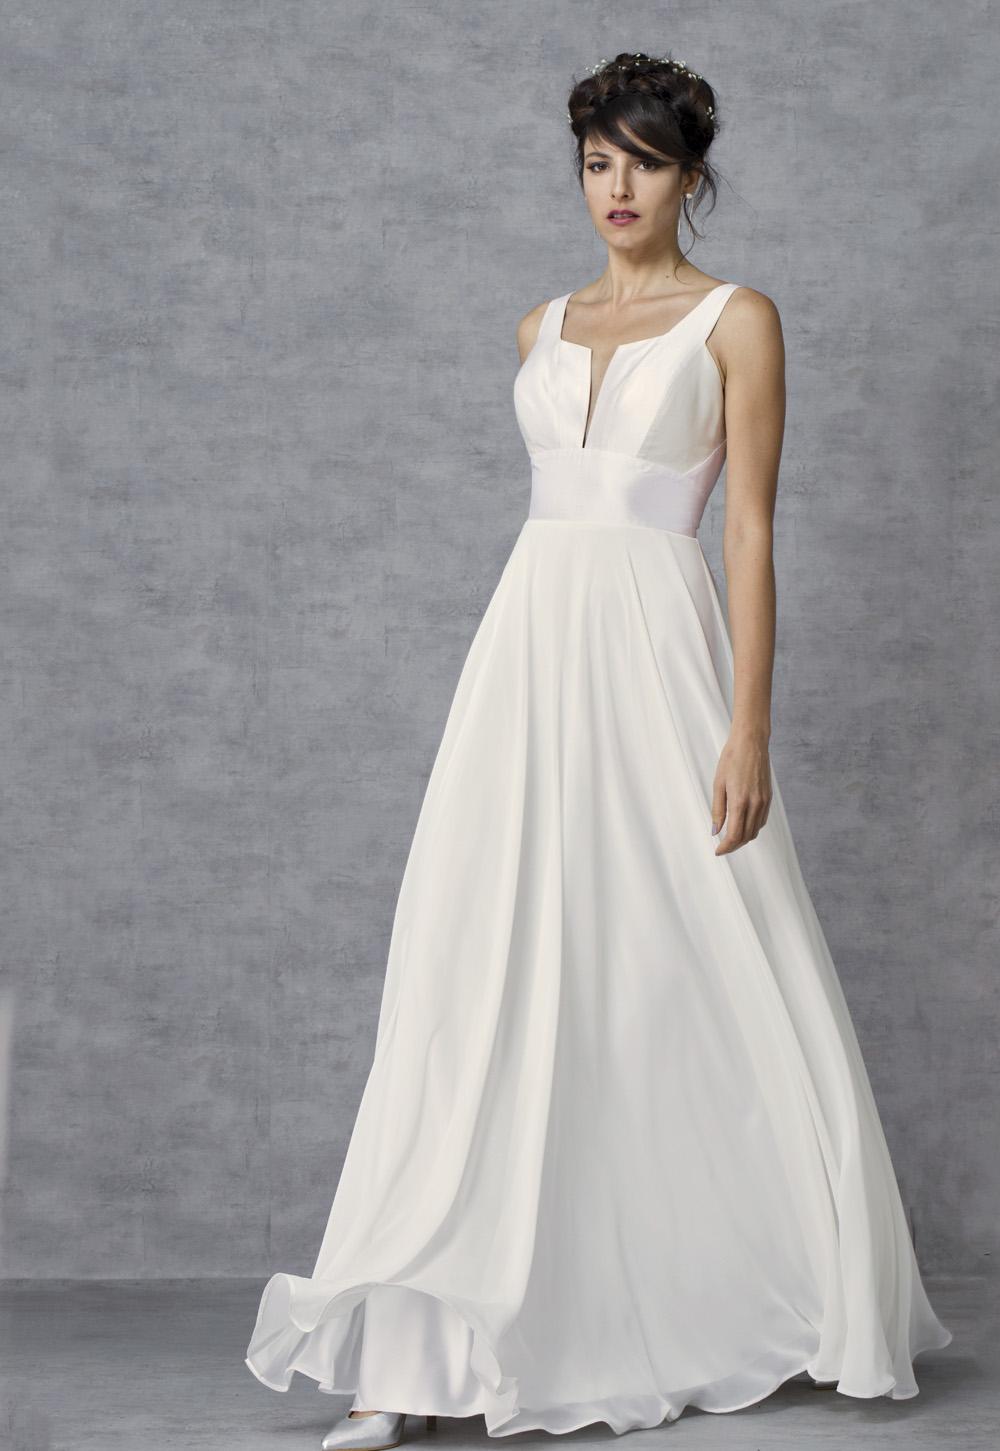 I3A9498 שמלות כלה - שמלה